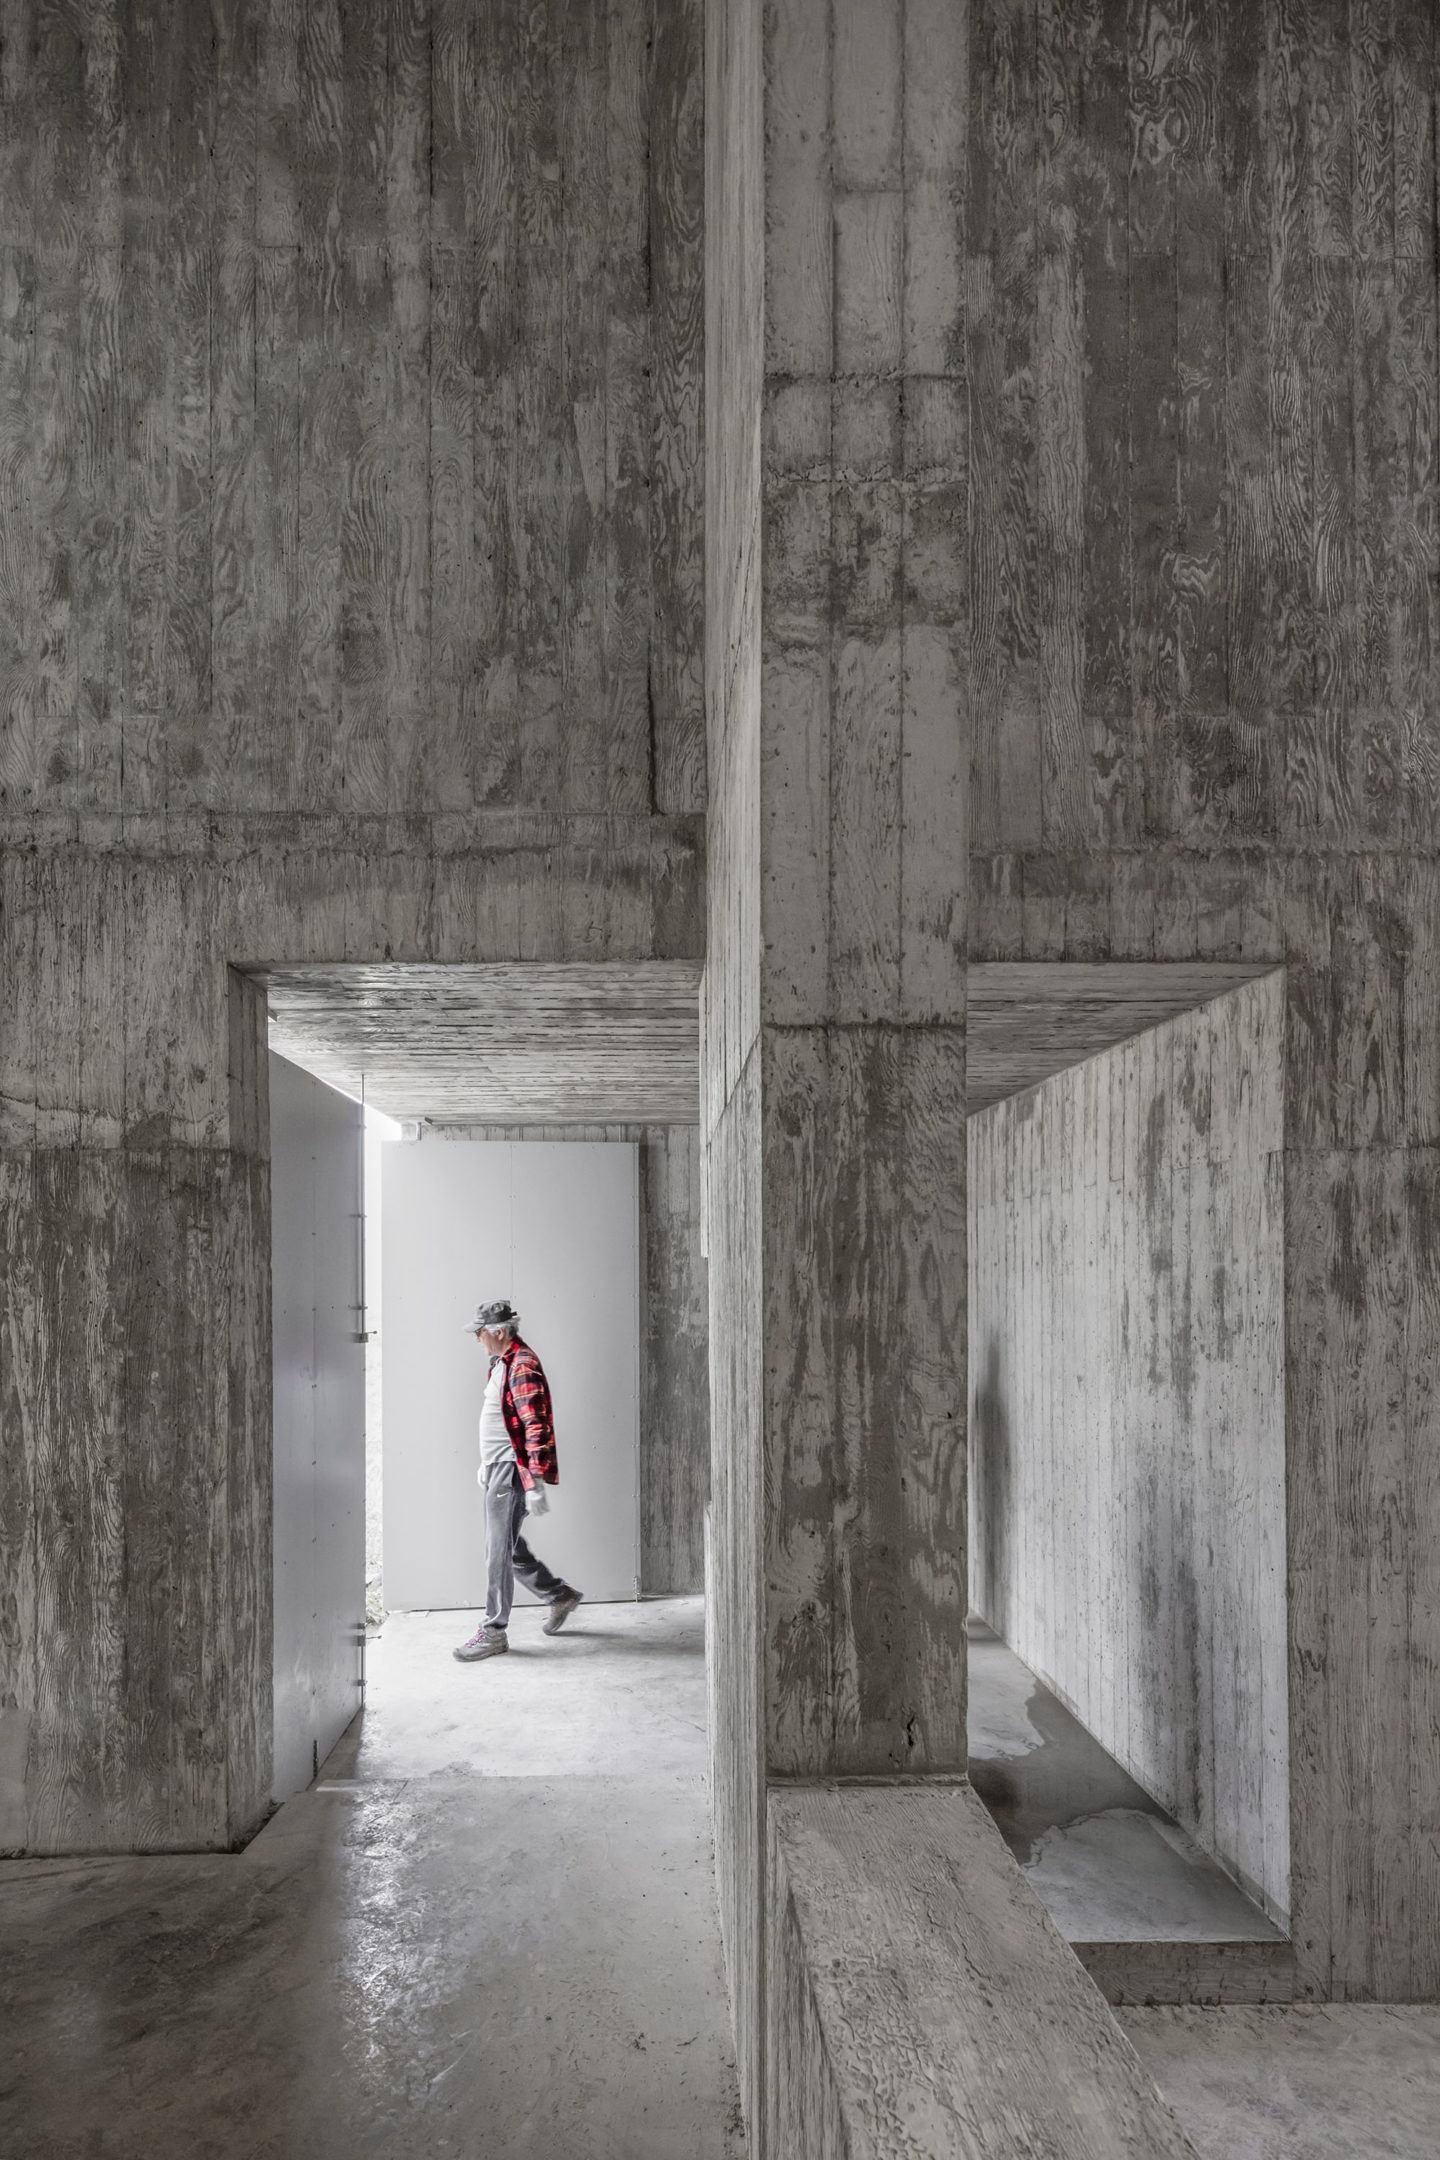 IGNANT-Architecture-Alvaro-Siza-Carlos-Castanheira-Art-Pavilion-Photographs-14